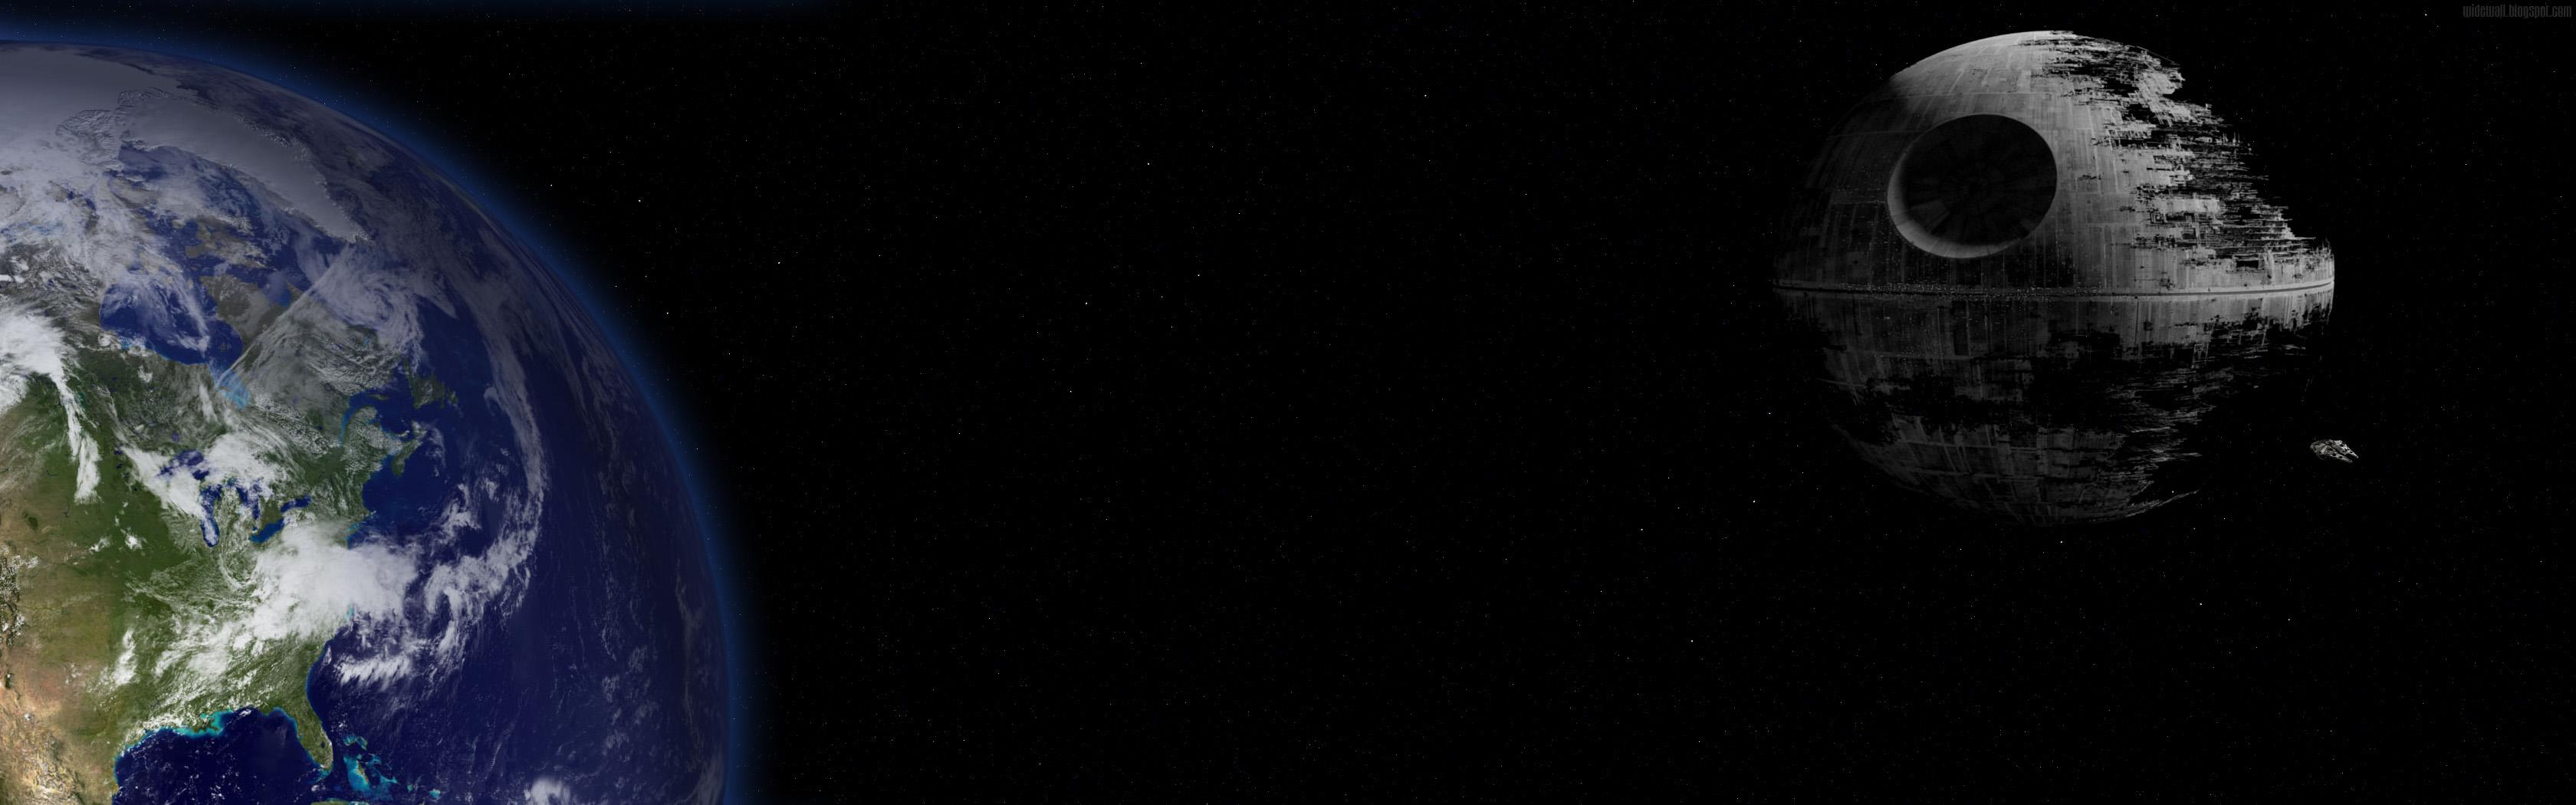 Death Star Wallpaper 3360x1050 ID19229   WallpaperVortexcom 3360x1050